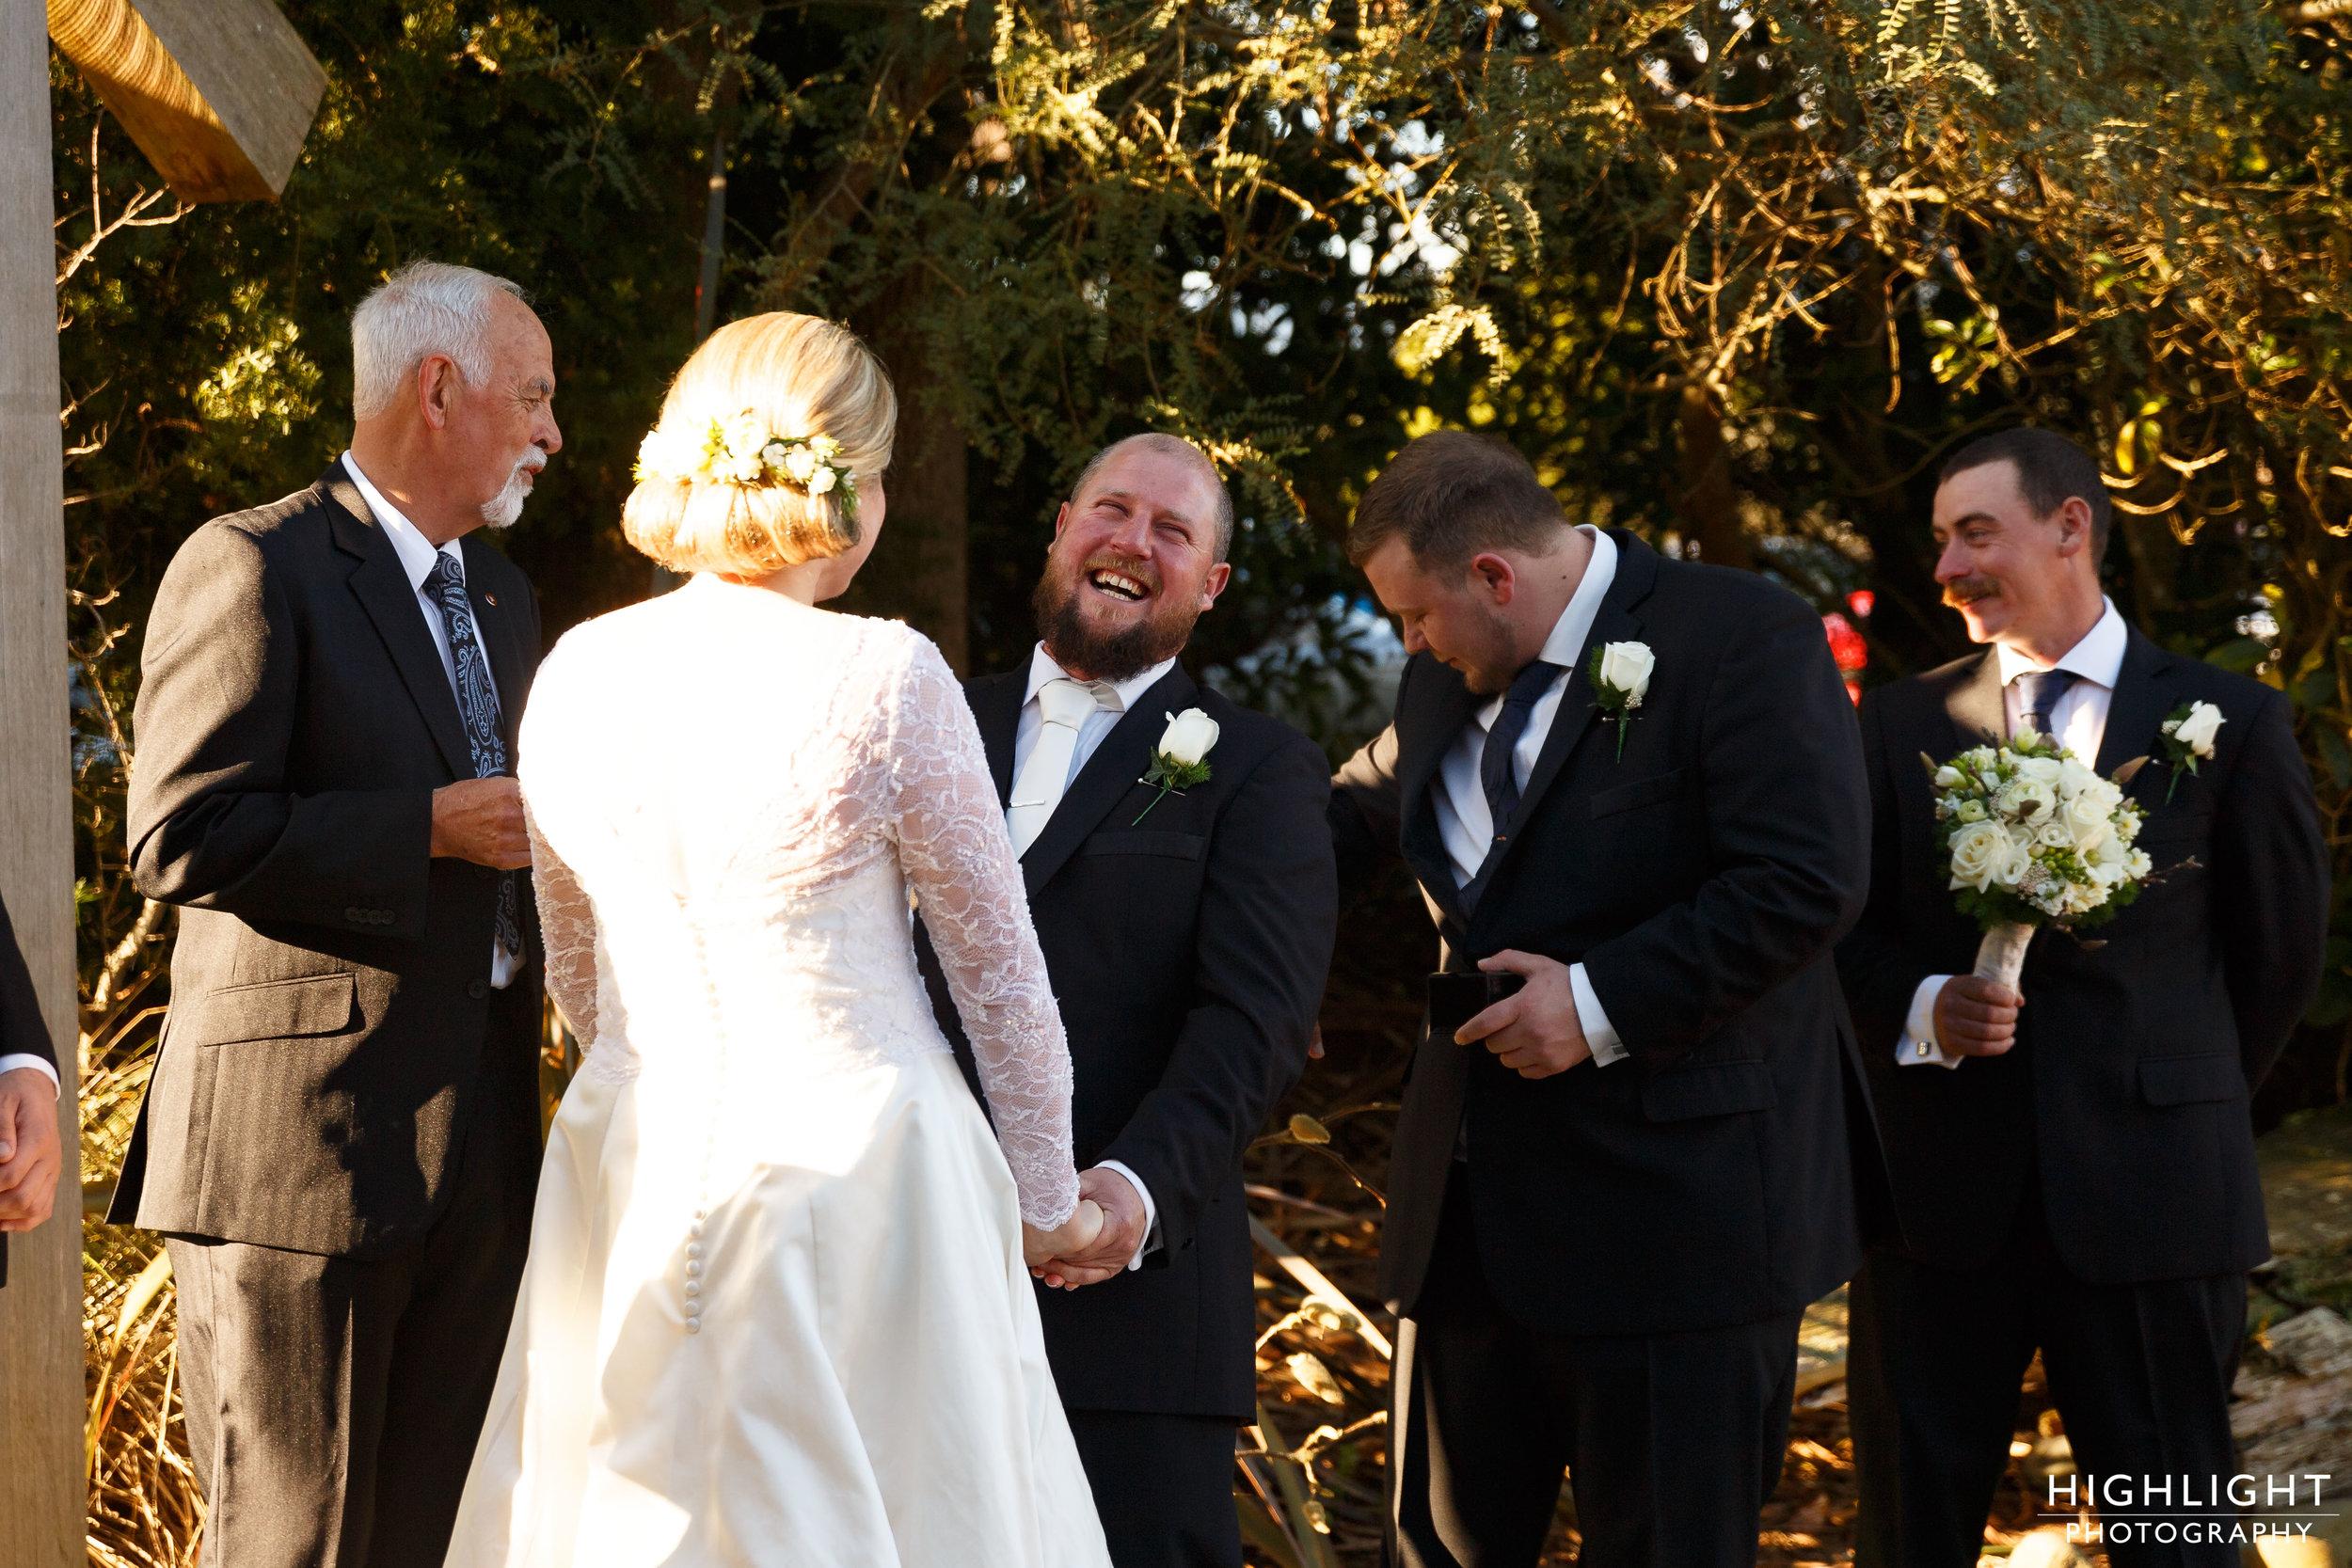 makoura-wedding-photography-highlight-new-zealand-35.jpg